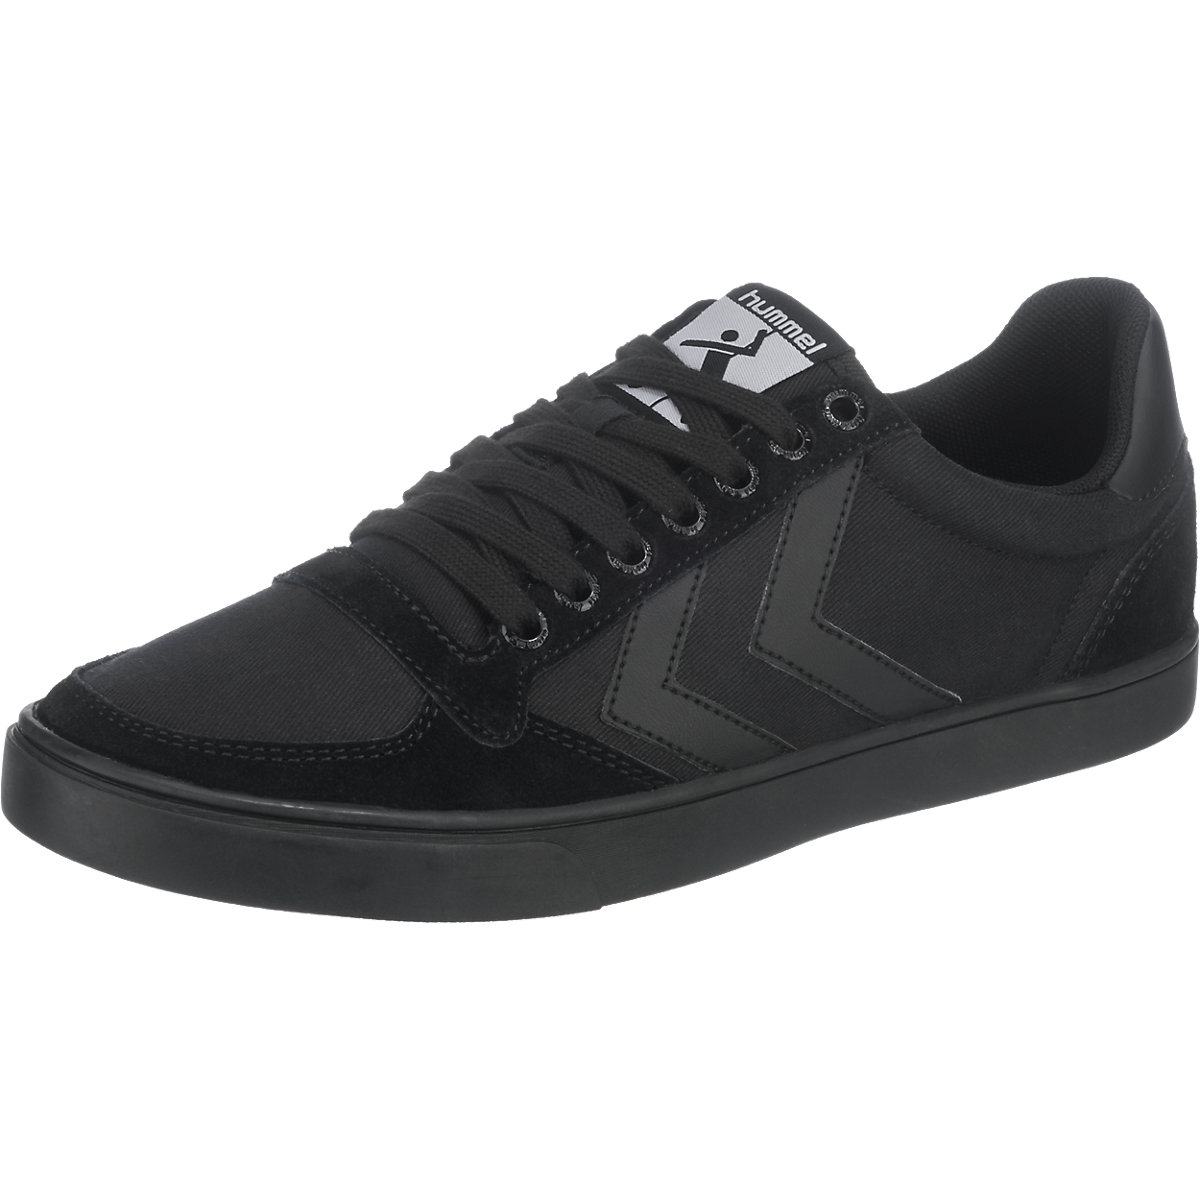 Hummel, Slimmer Stadil Tonal Turnschuhe Low, schwarz  Gute Qualität beliebte Schuhe